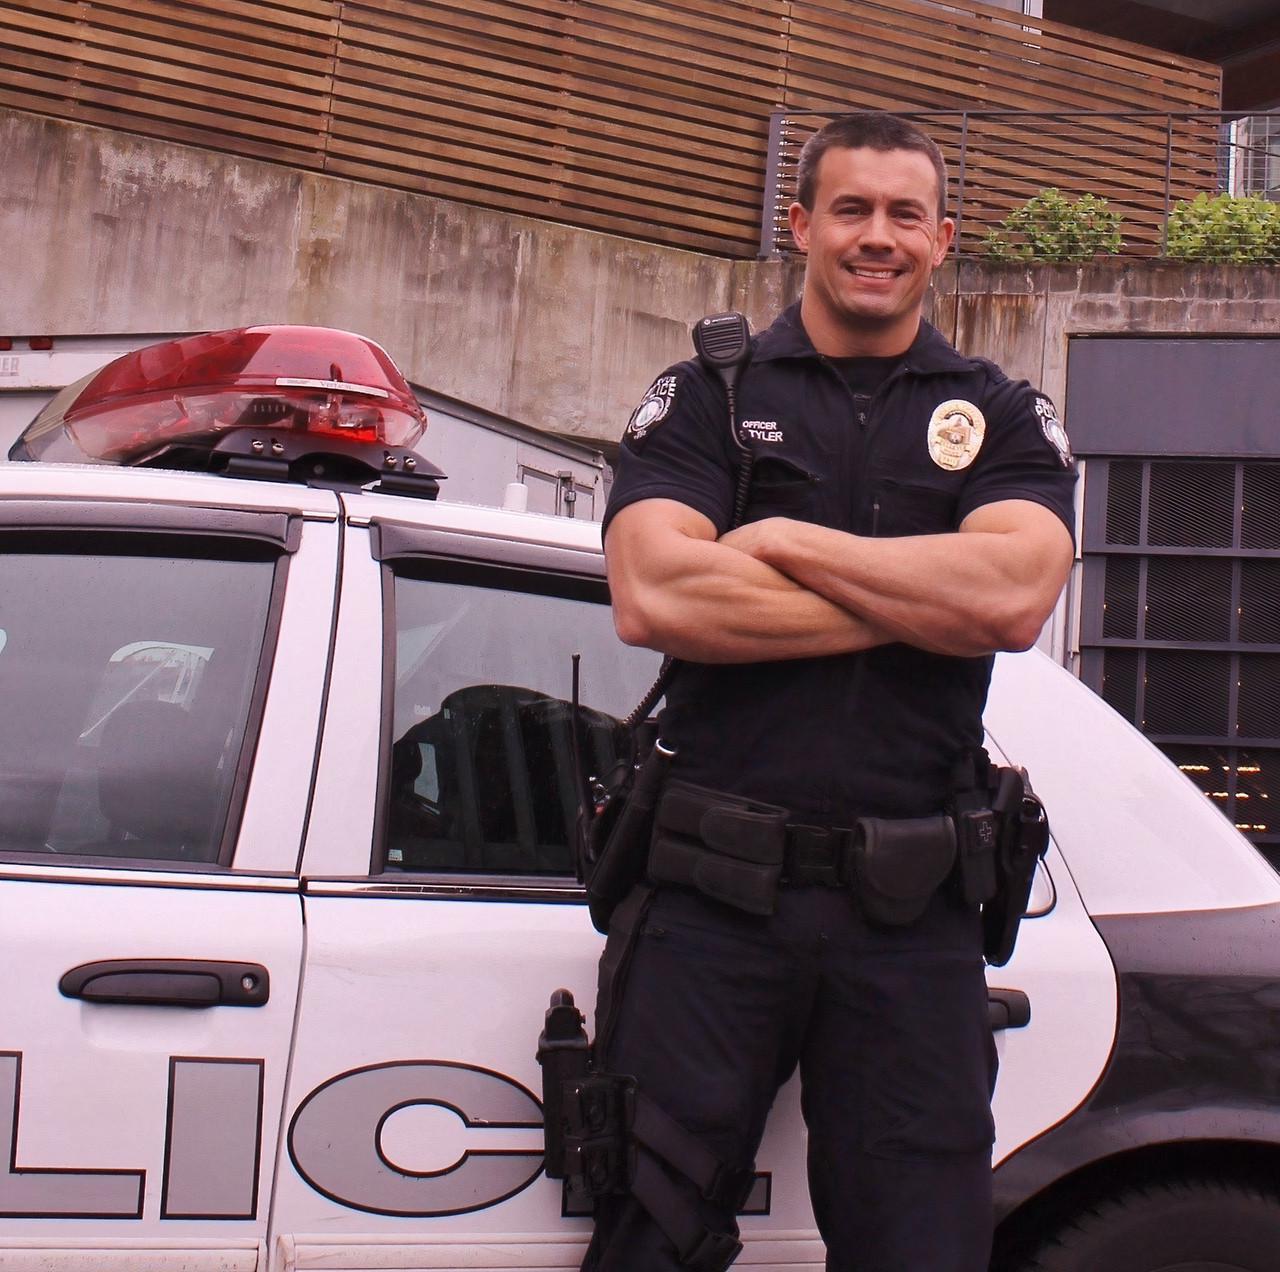 sexy-mature-masculine-cop-daddy-handsome-uniformed-policeman-dilf